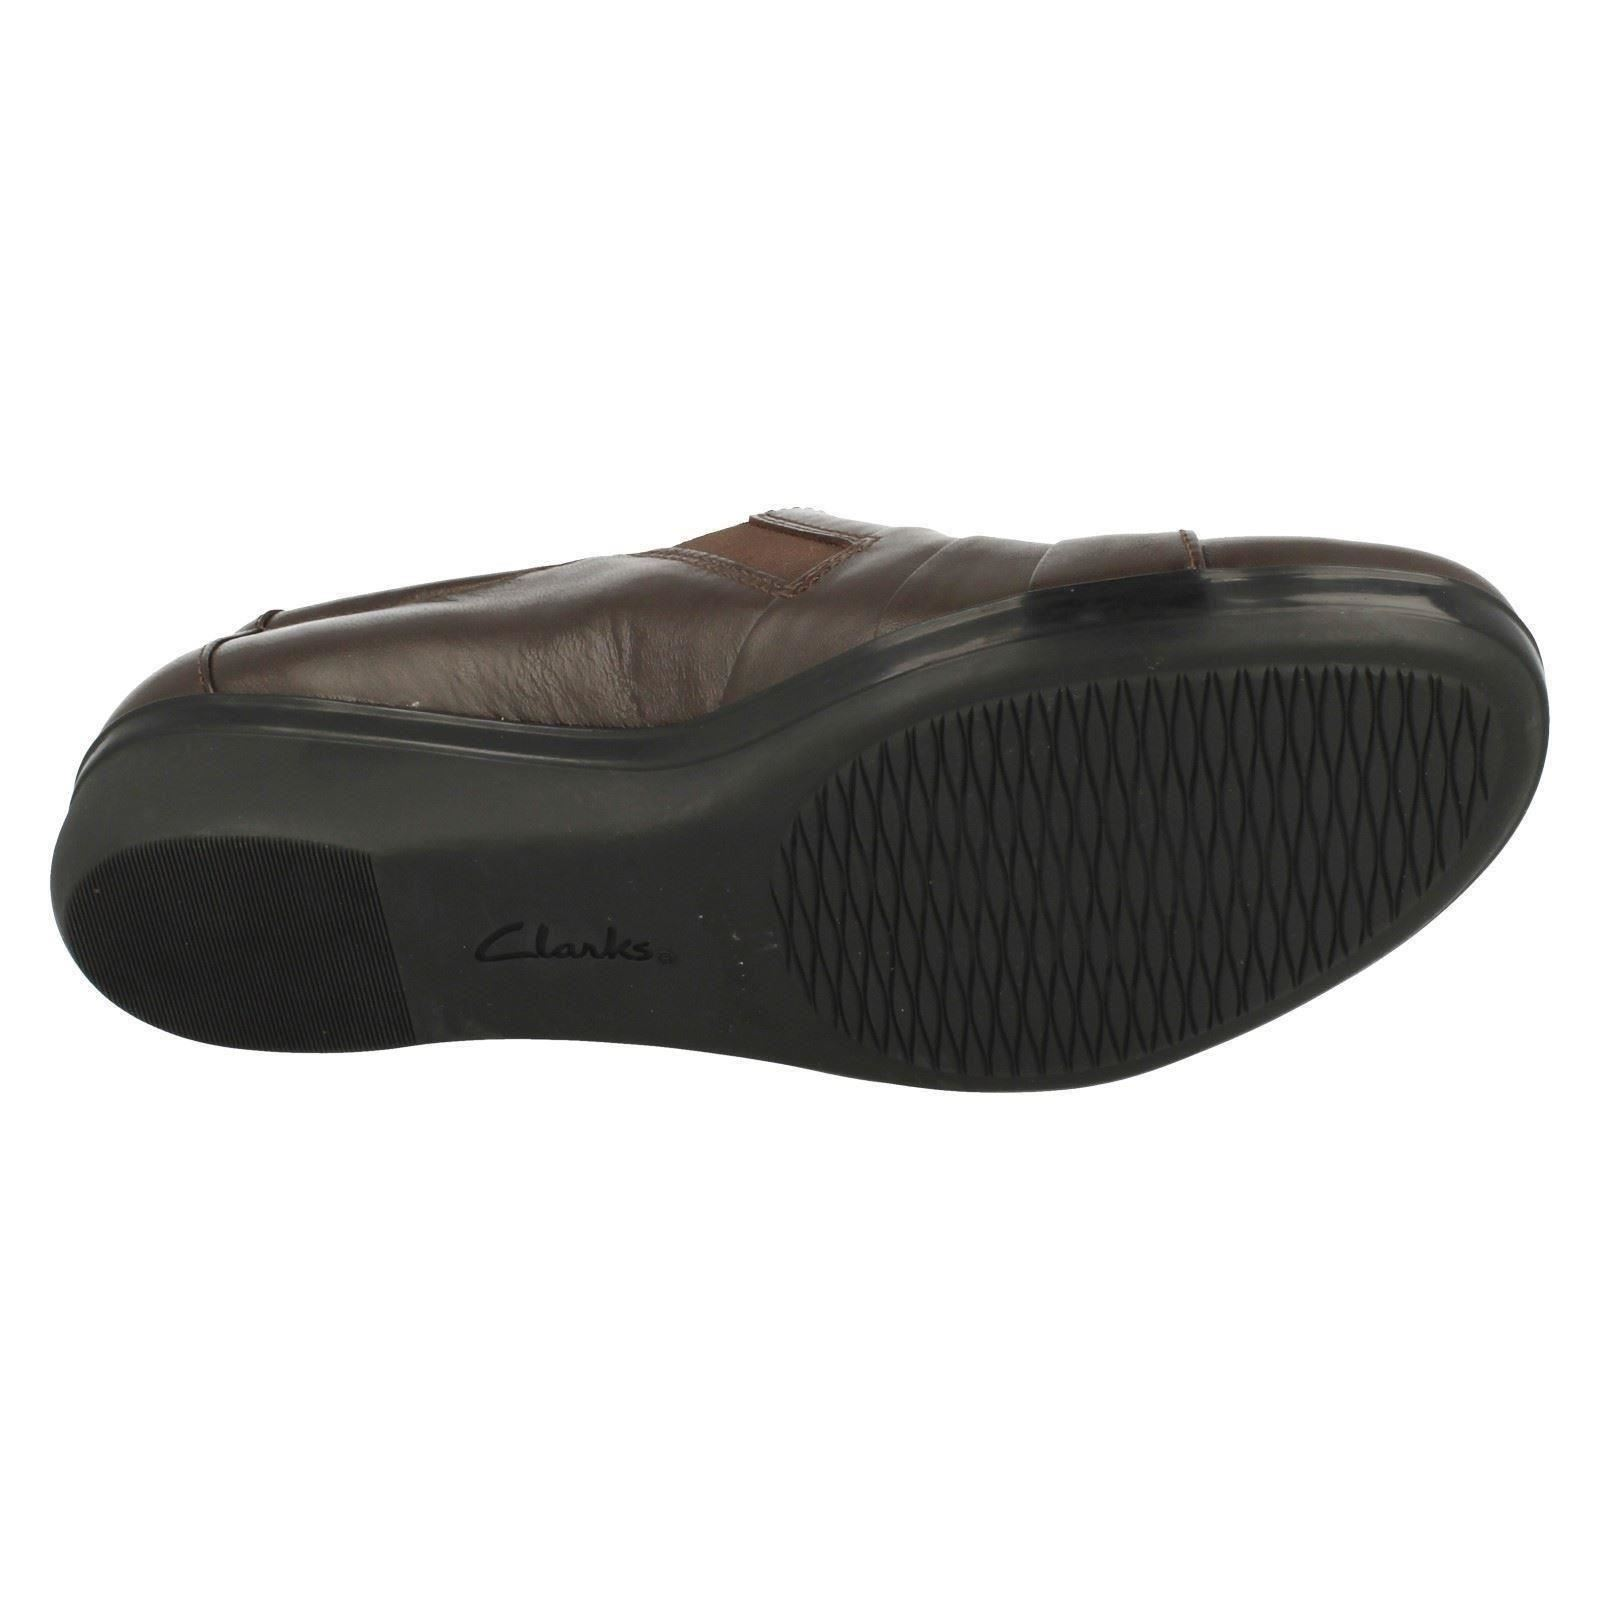 Ladies Clarks Everlay Luna Smart Shoes